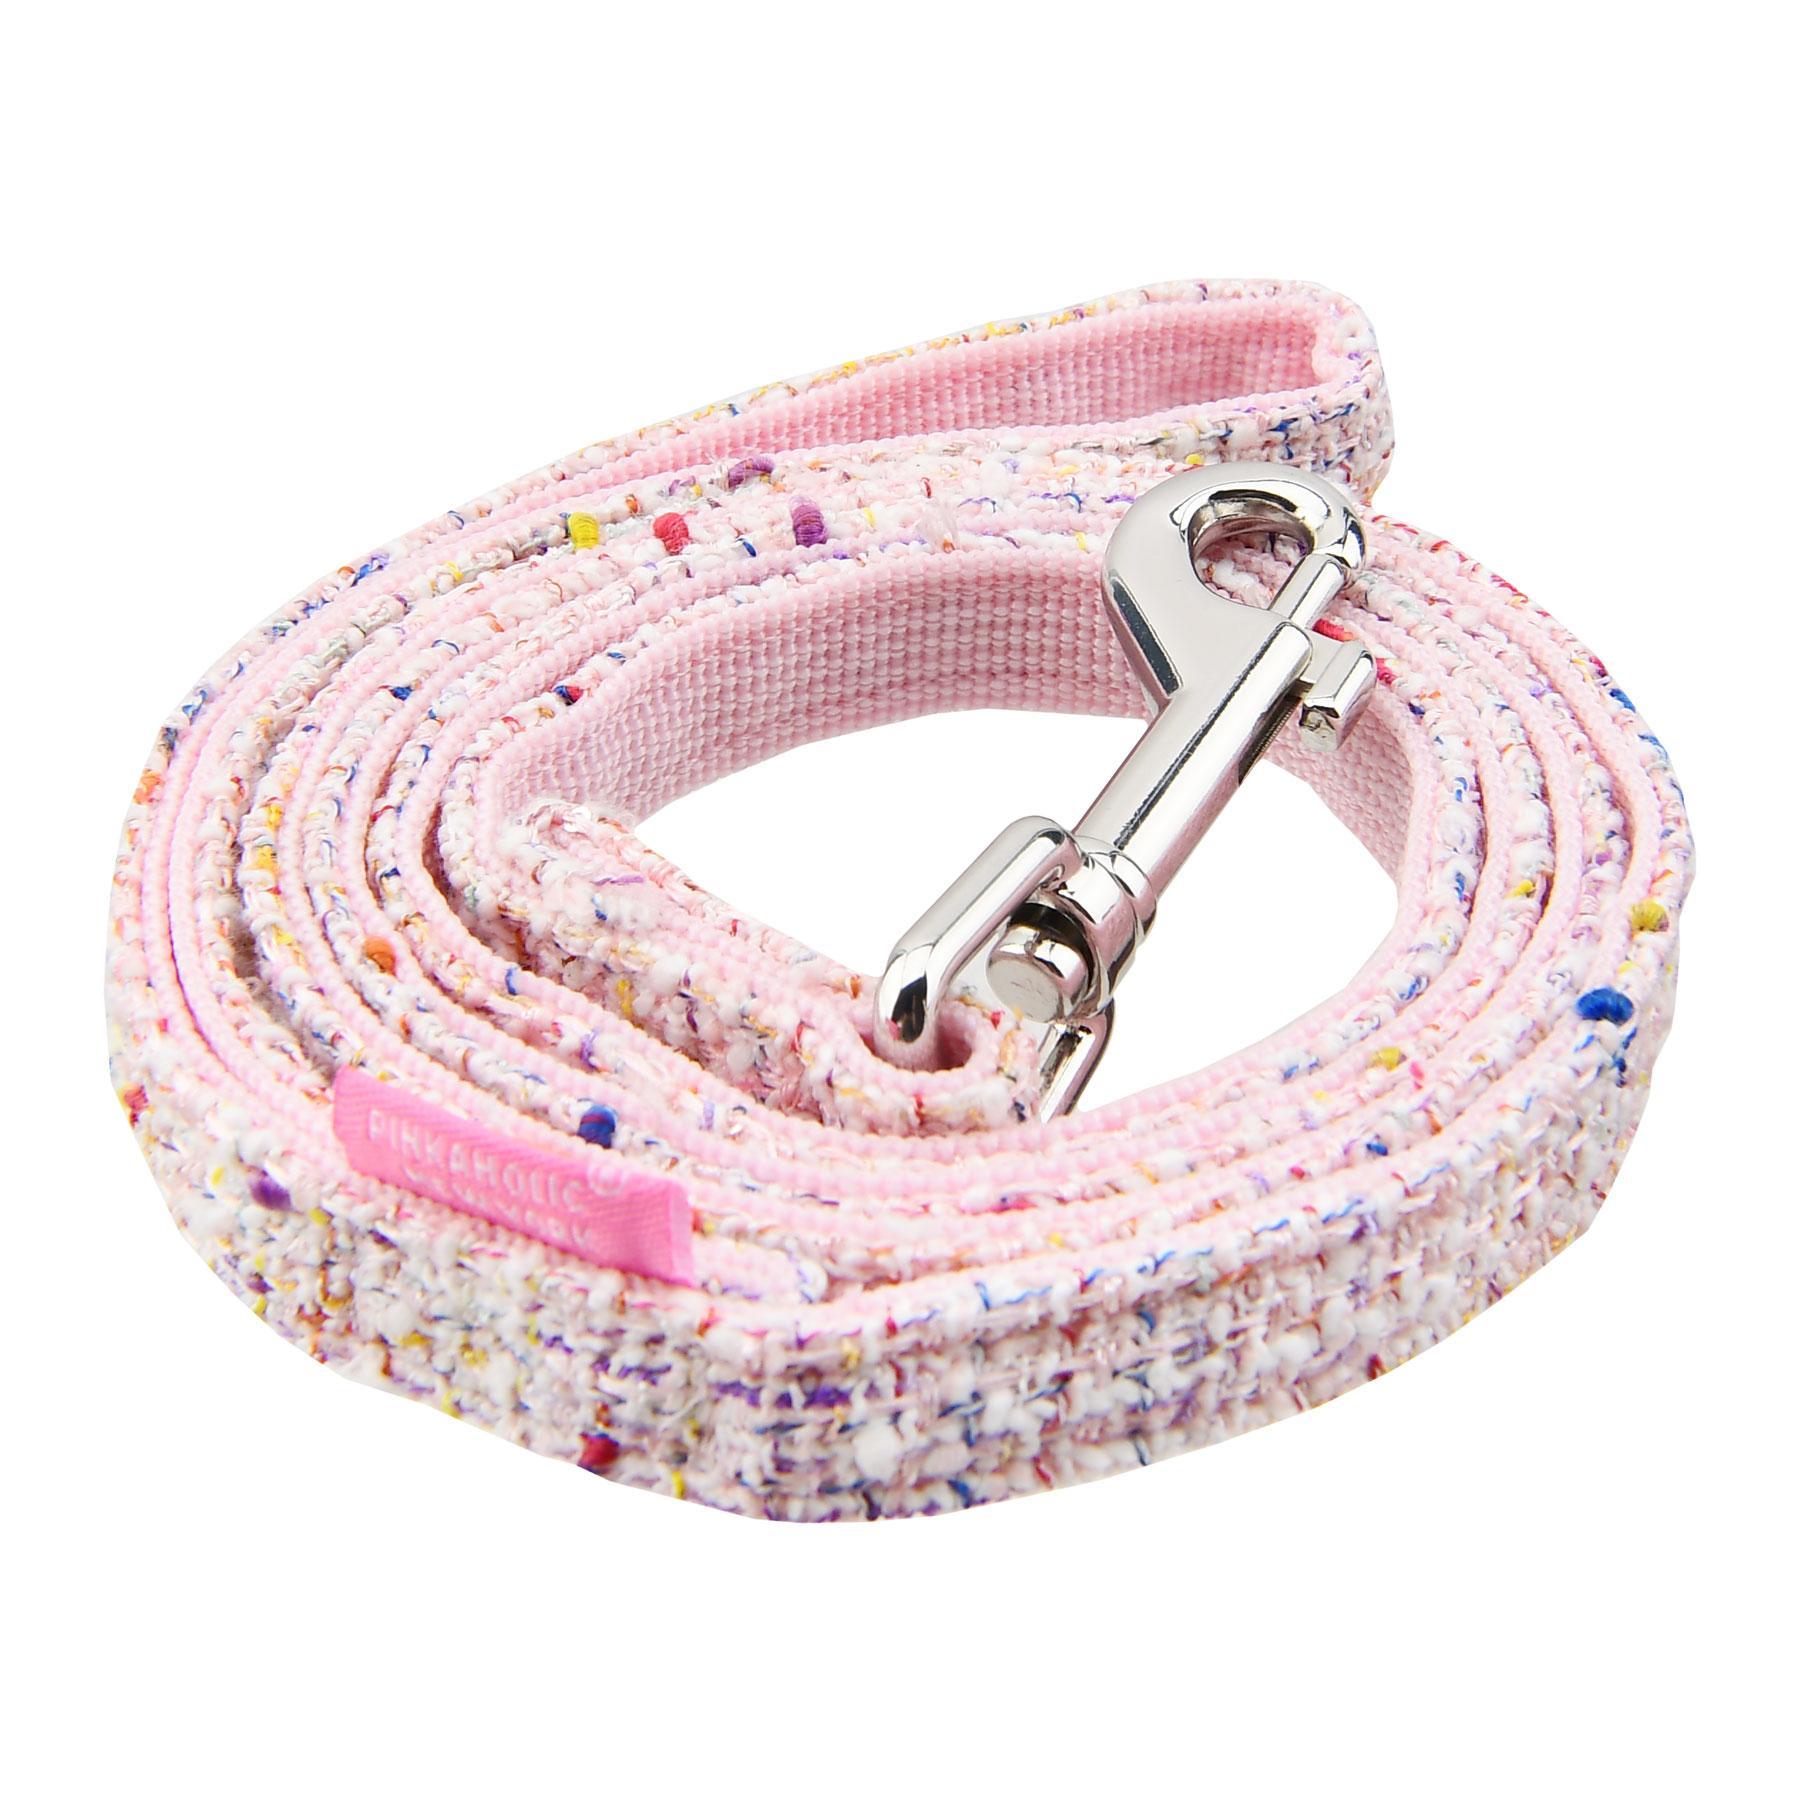 Posh Dog Leash by Pinkaholic - Pink